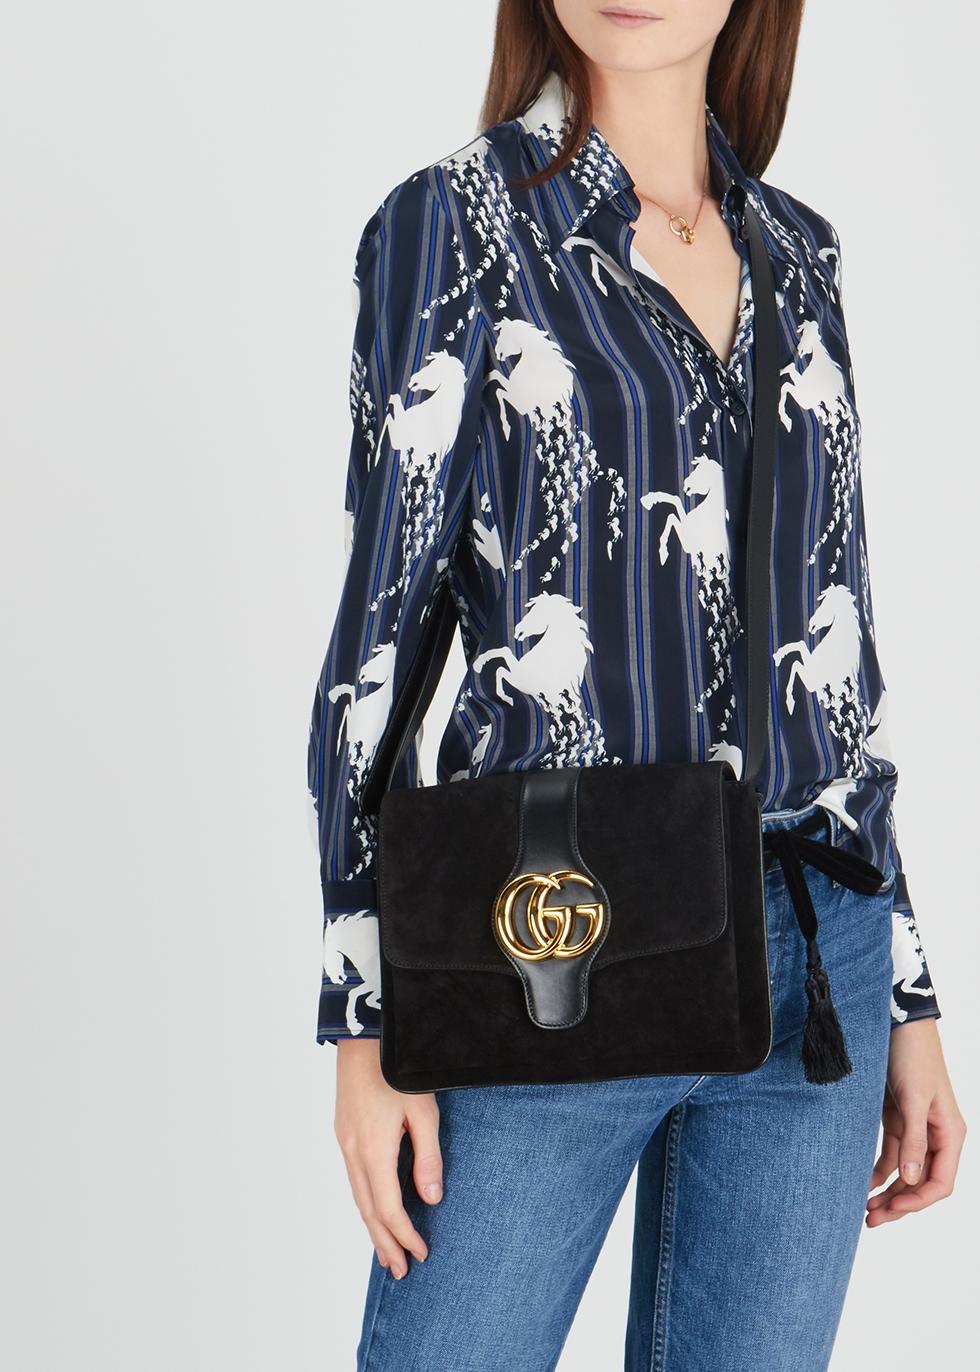 4b8cefe63 Gucci Arli medium suede shoulder bag - Harvey Nichols